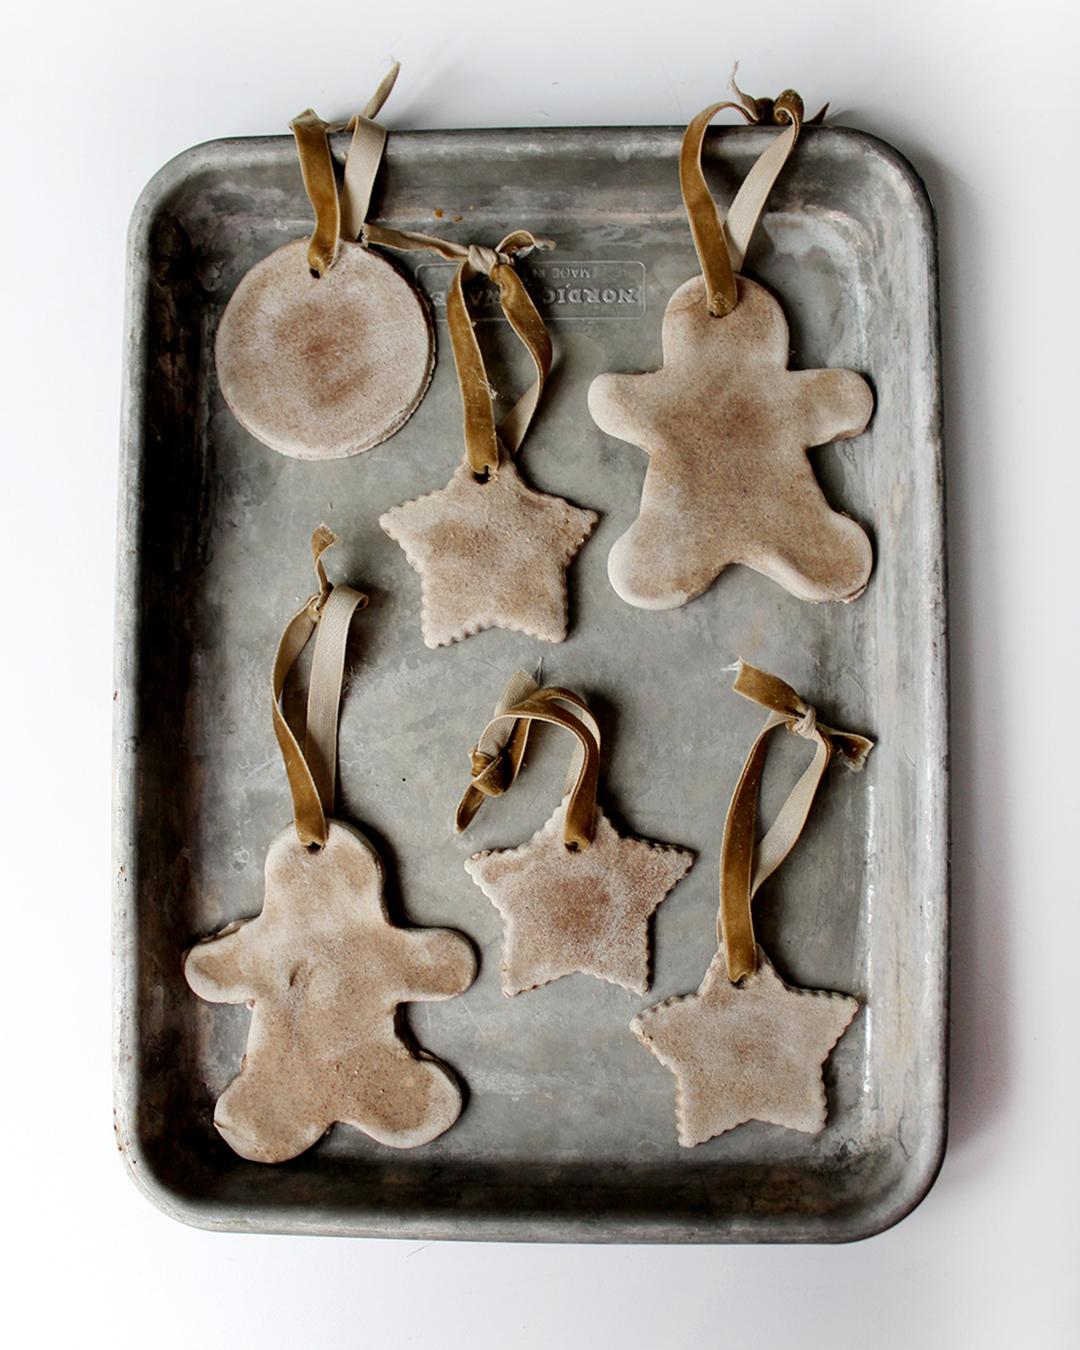 Make Salt Dough Ornaments With Cinnamon & Maple Ginger Tea